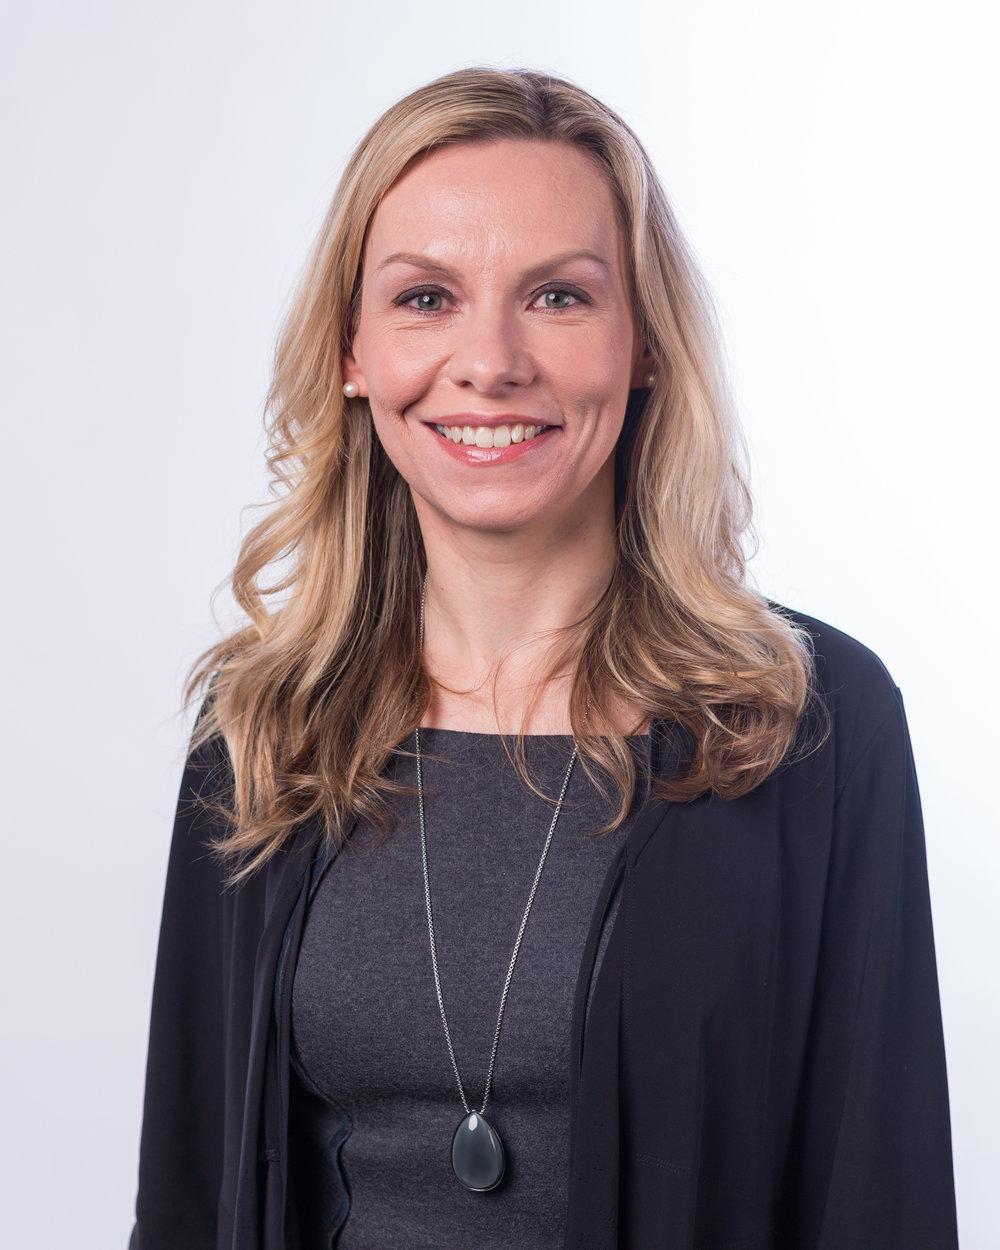 Elizabeth Kiehner